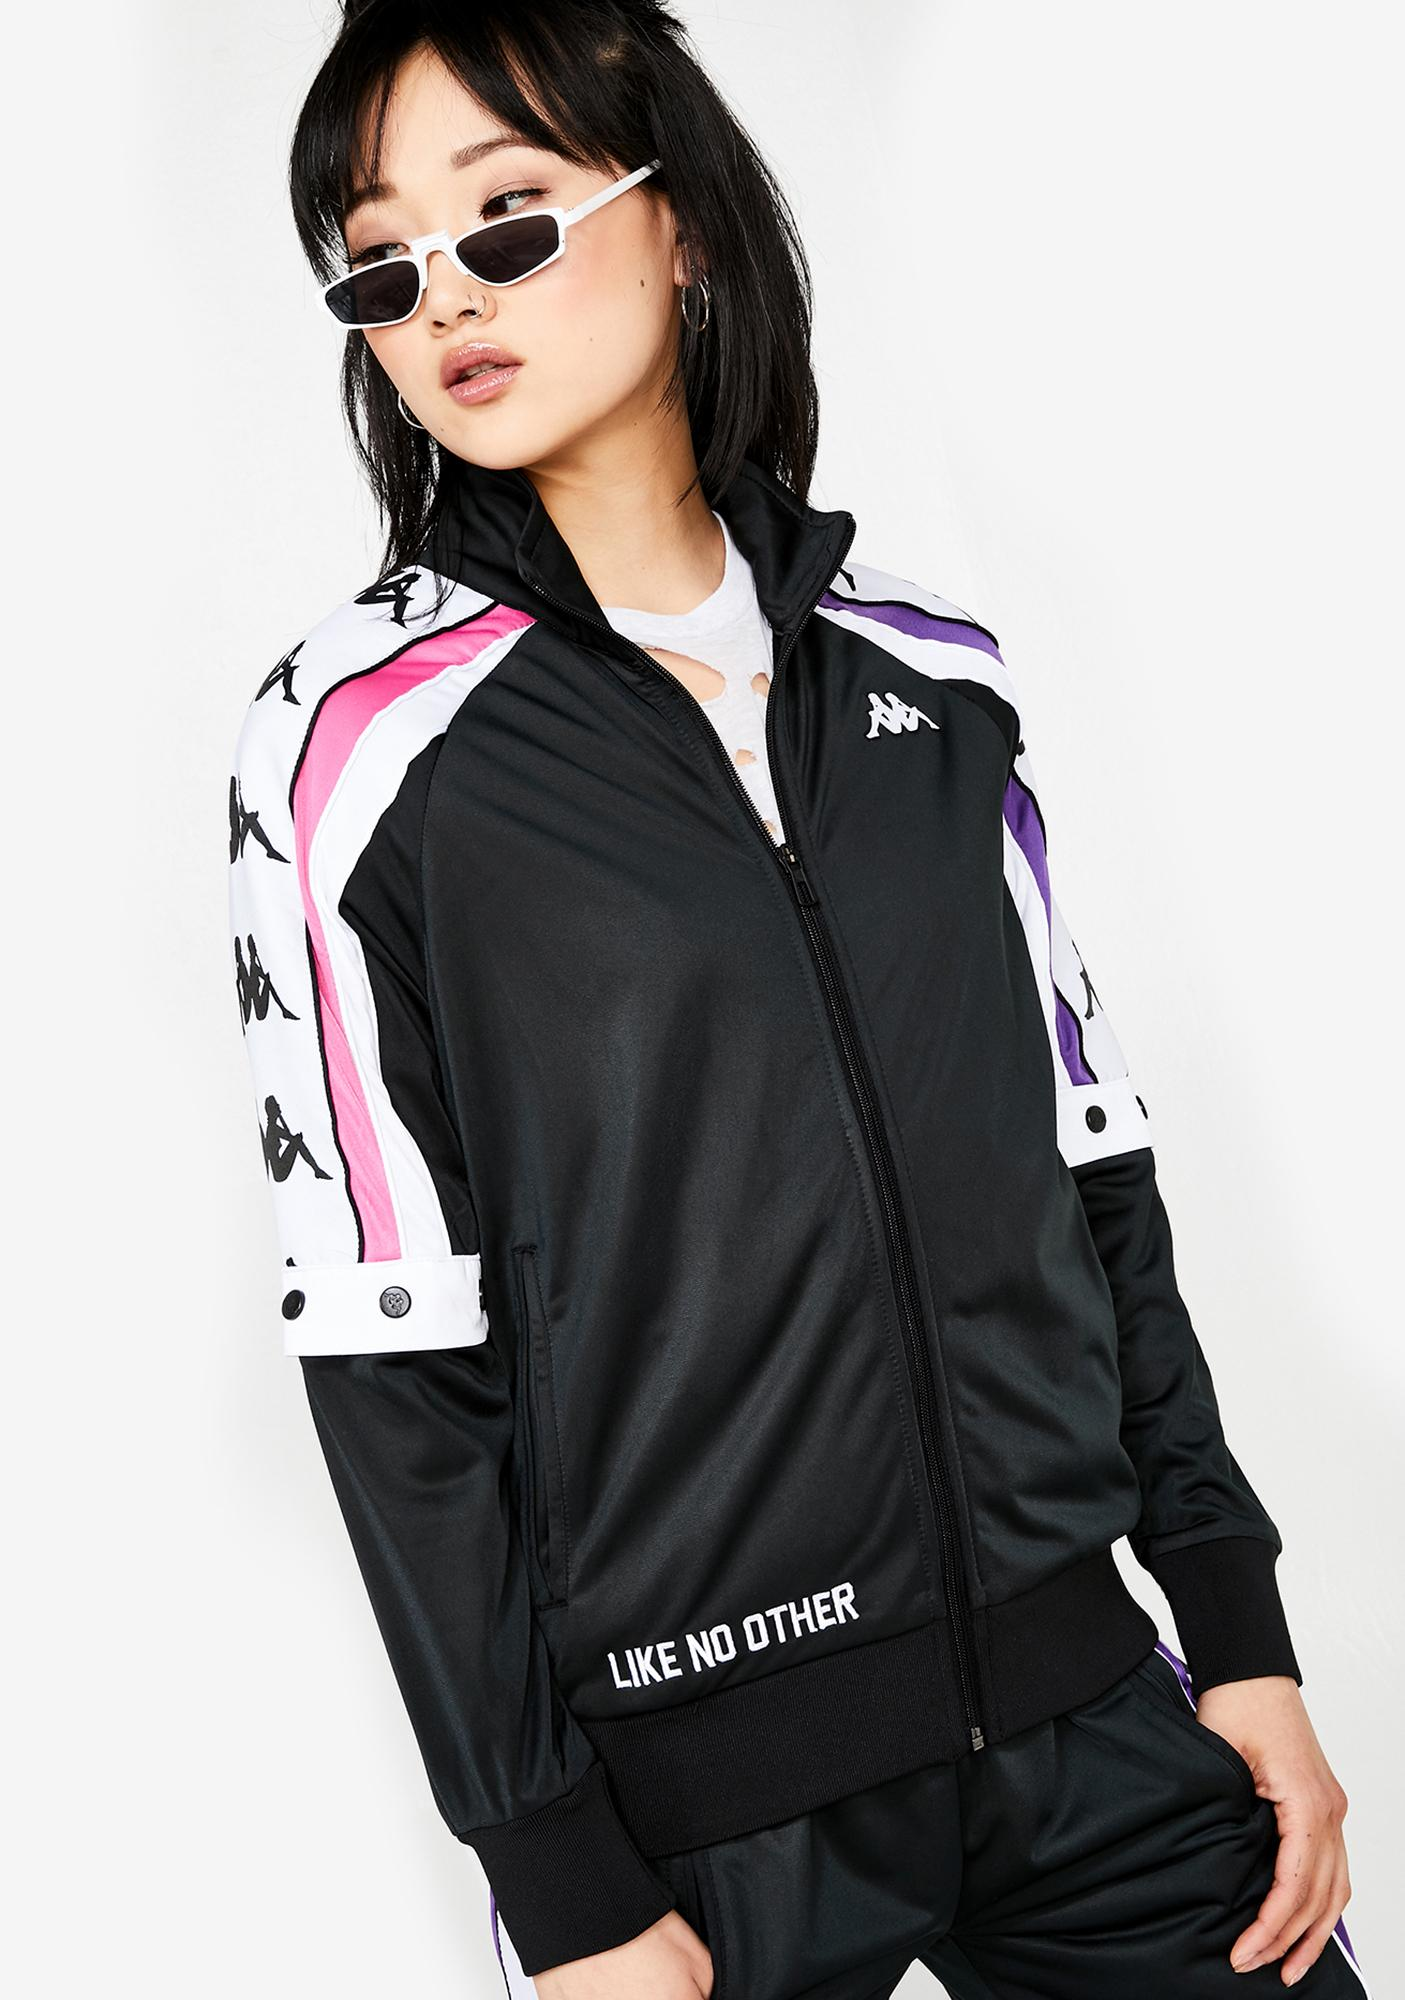 2185bff26c Authentic Byap Zip Jacket